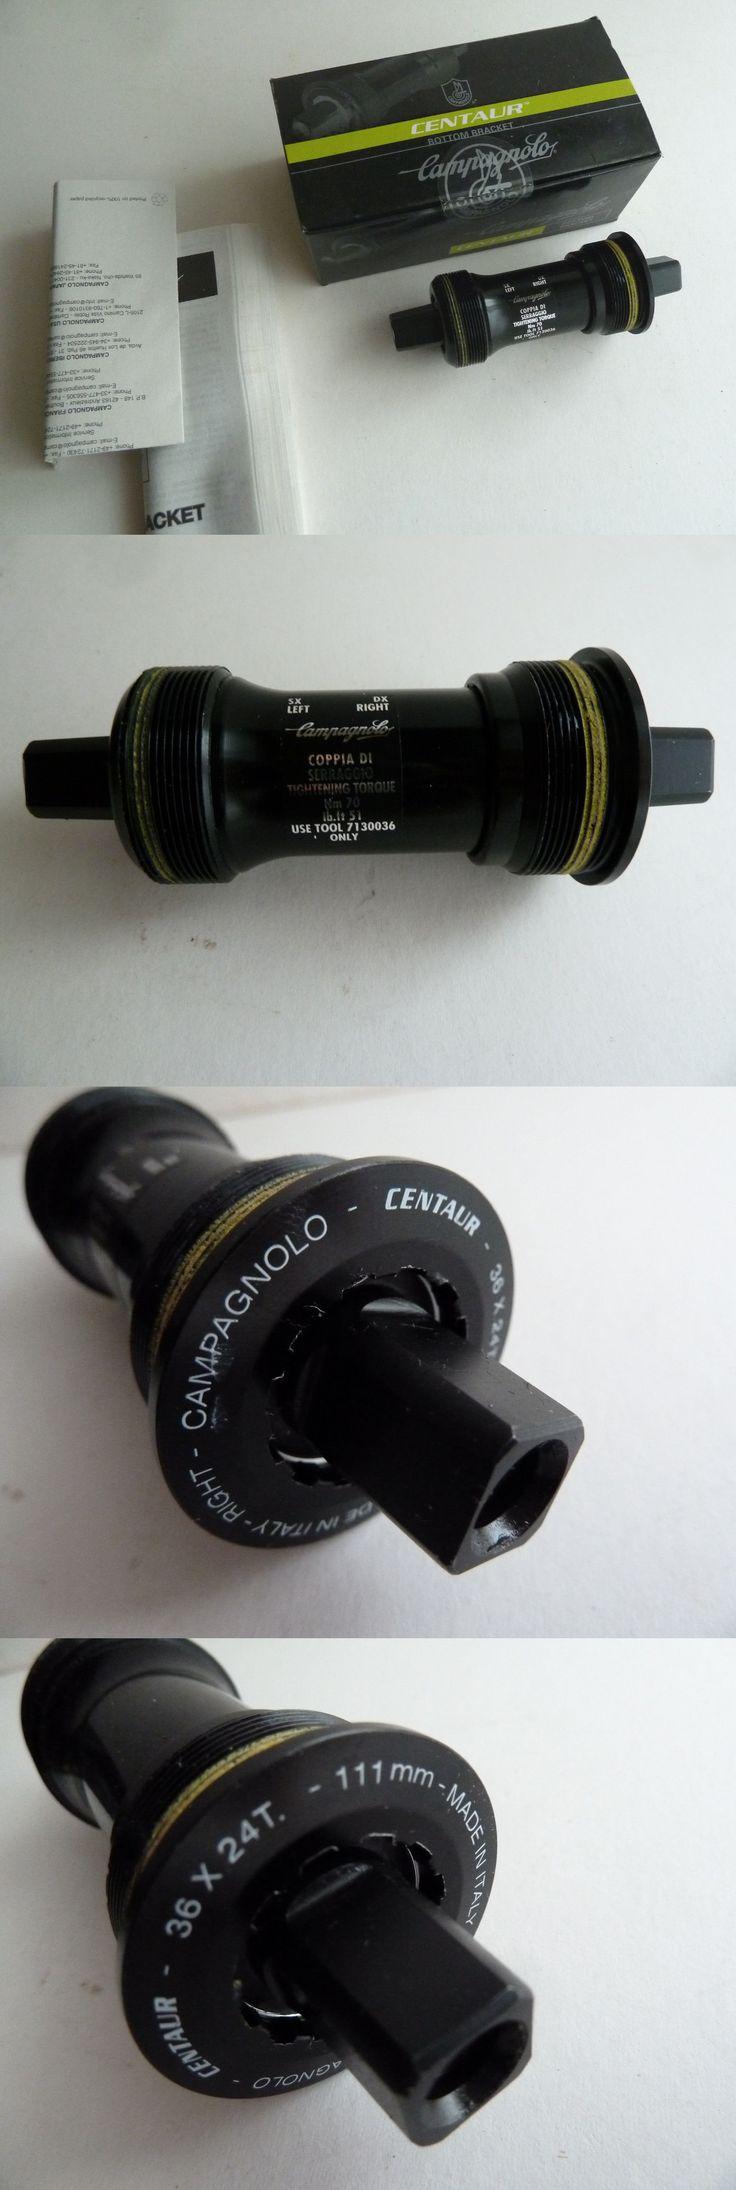 Bottom Brackets 177805: New Campagnolo Centaur Bottom Bracket, 70X111, Italian, Cartridge, Square Taper -> BUY IT NOW ONLY: $49.0 on eBay!